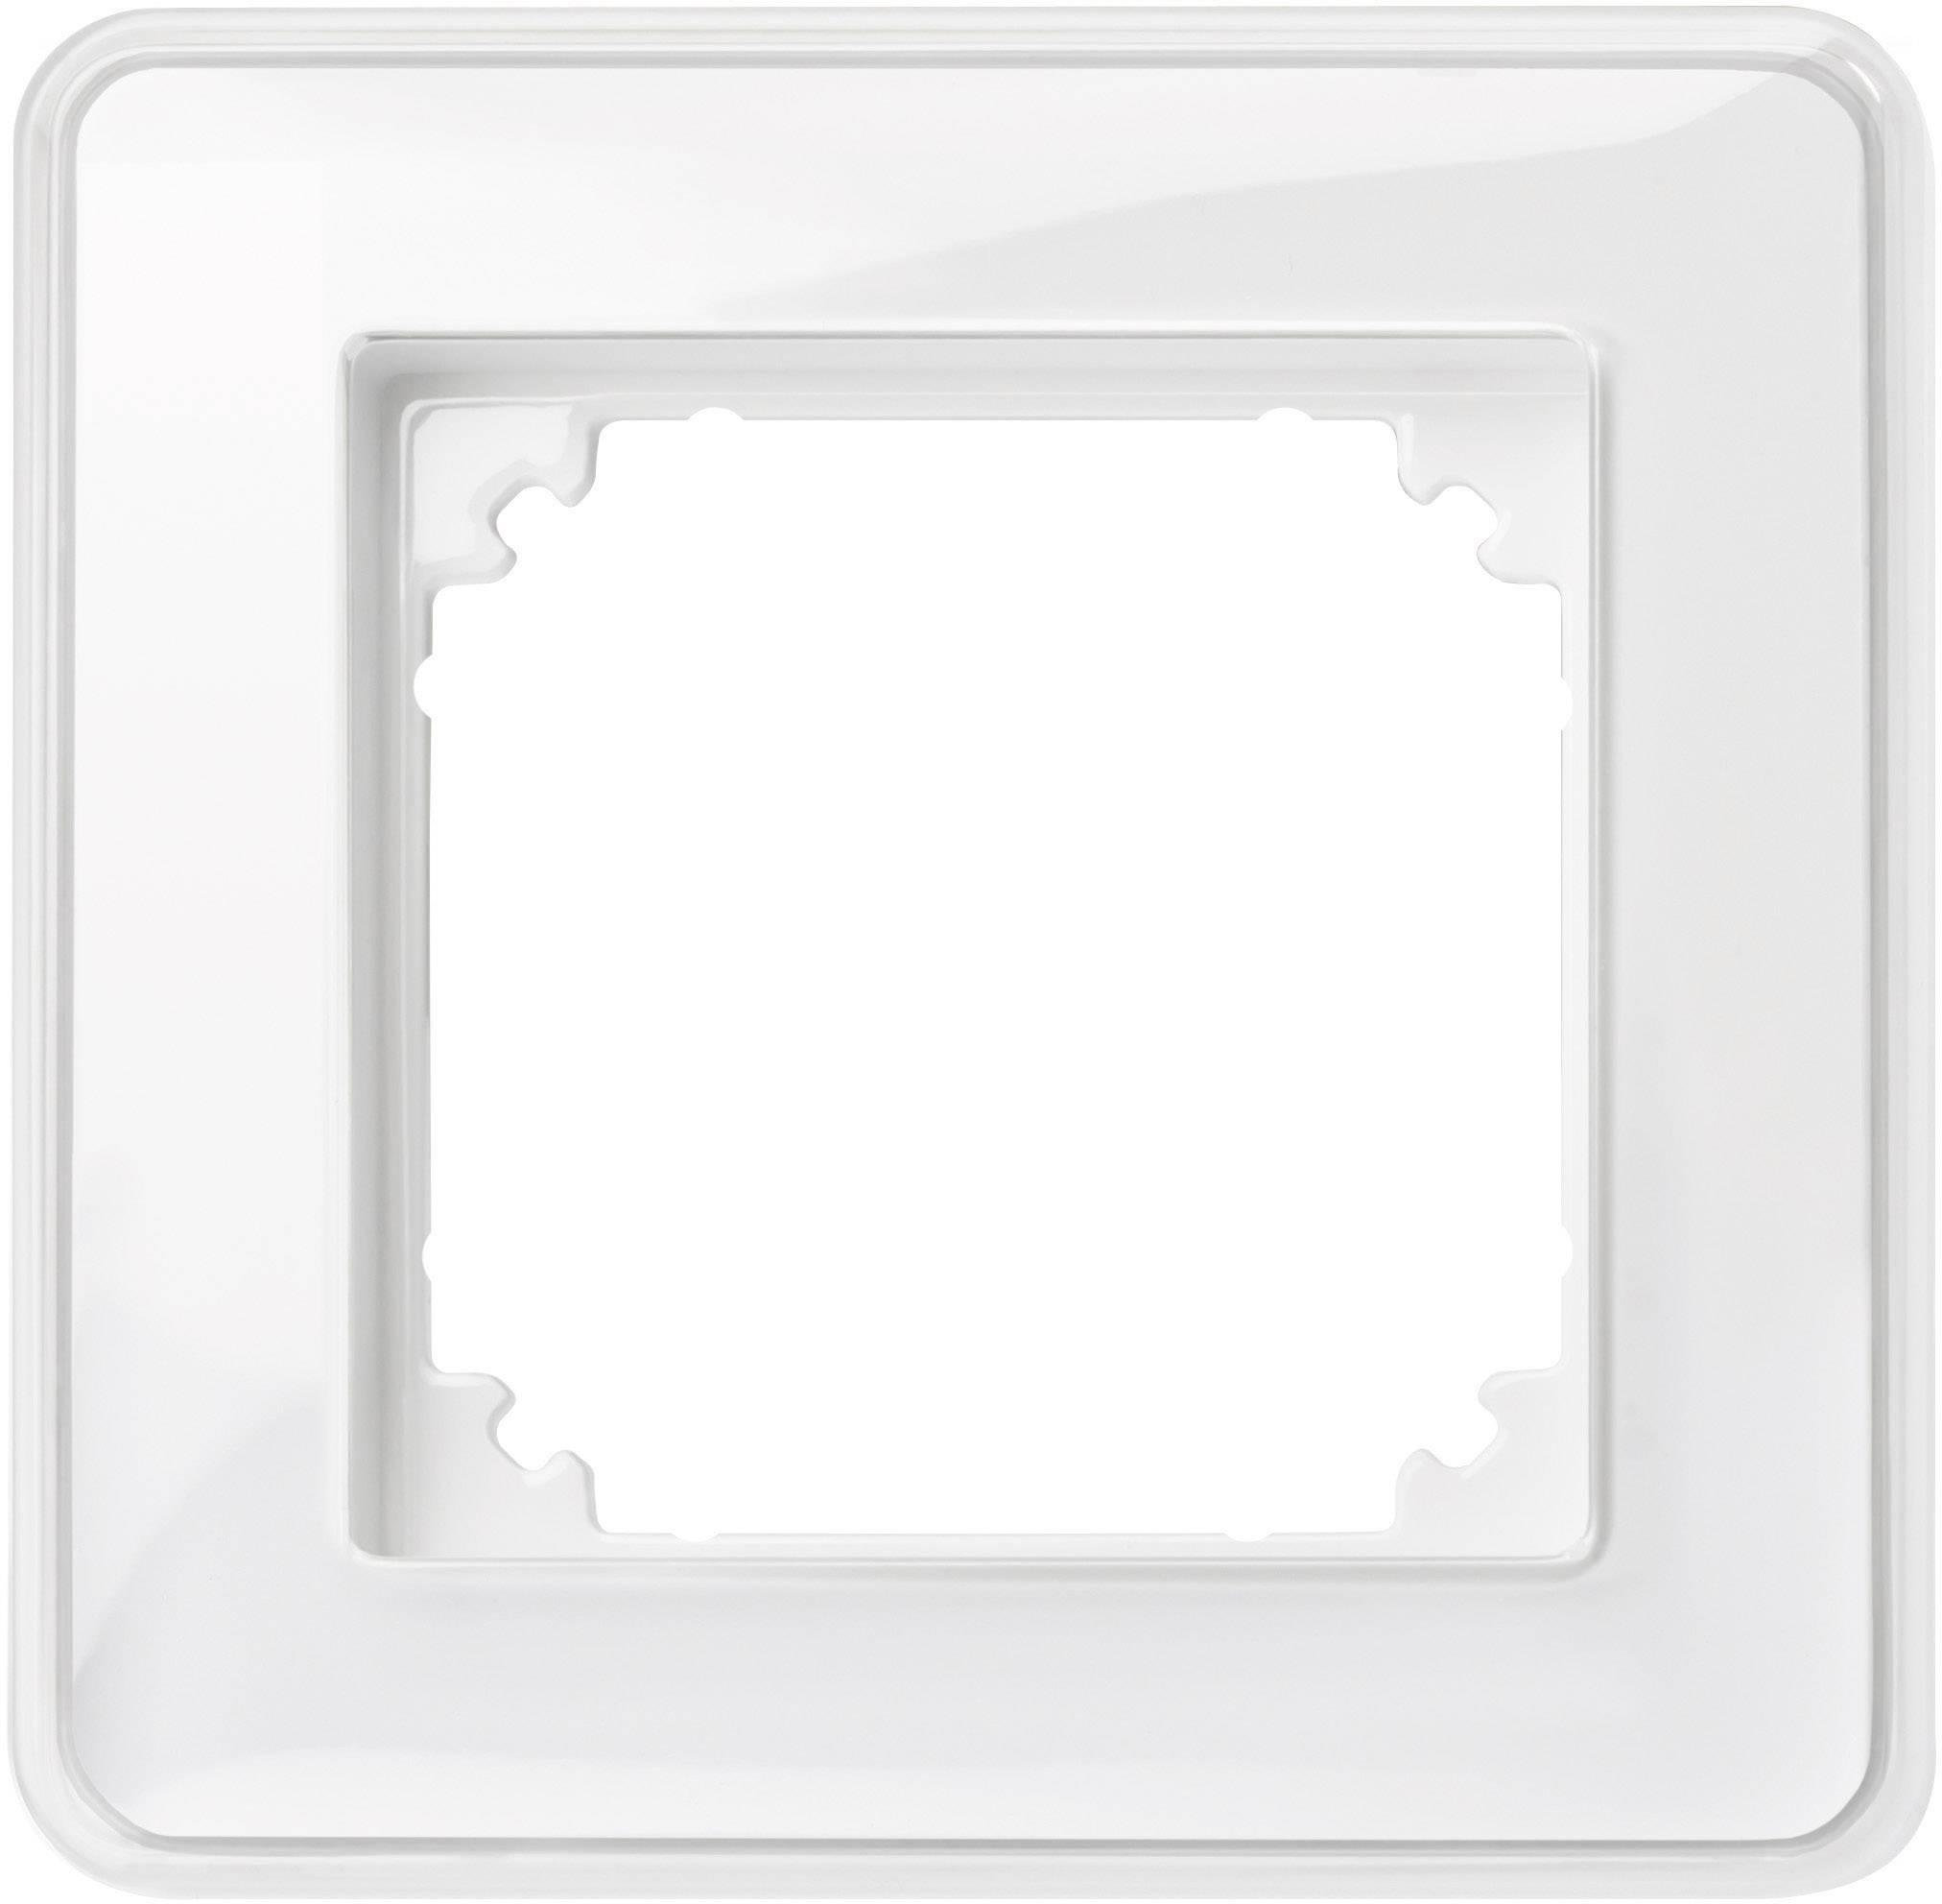 Rámeček 1násobný Merten M-Creativ, polární bílá (MEG4010-3500)